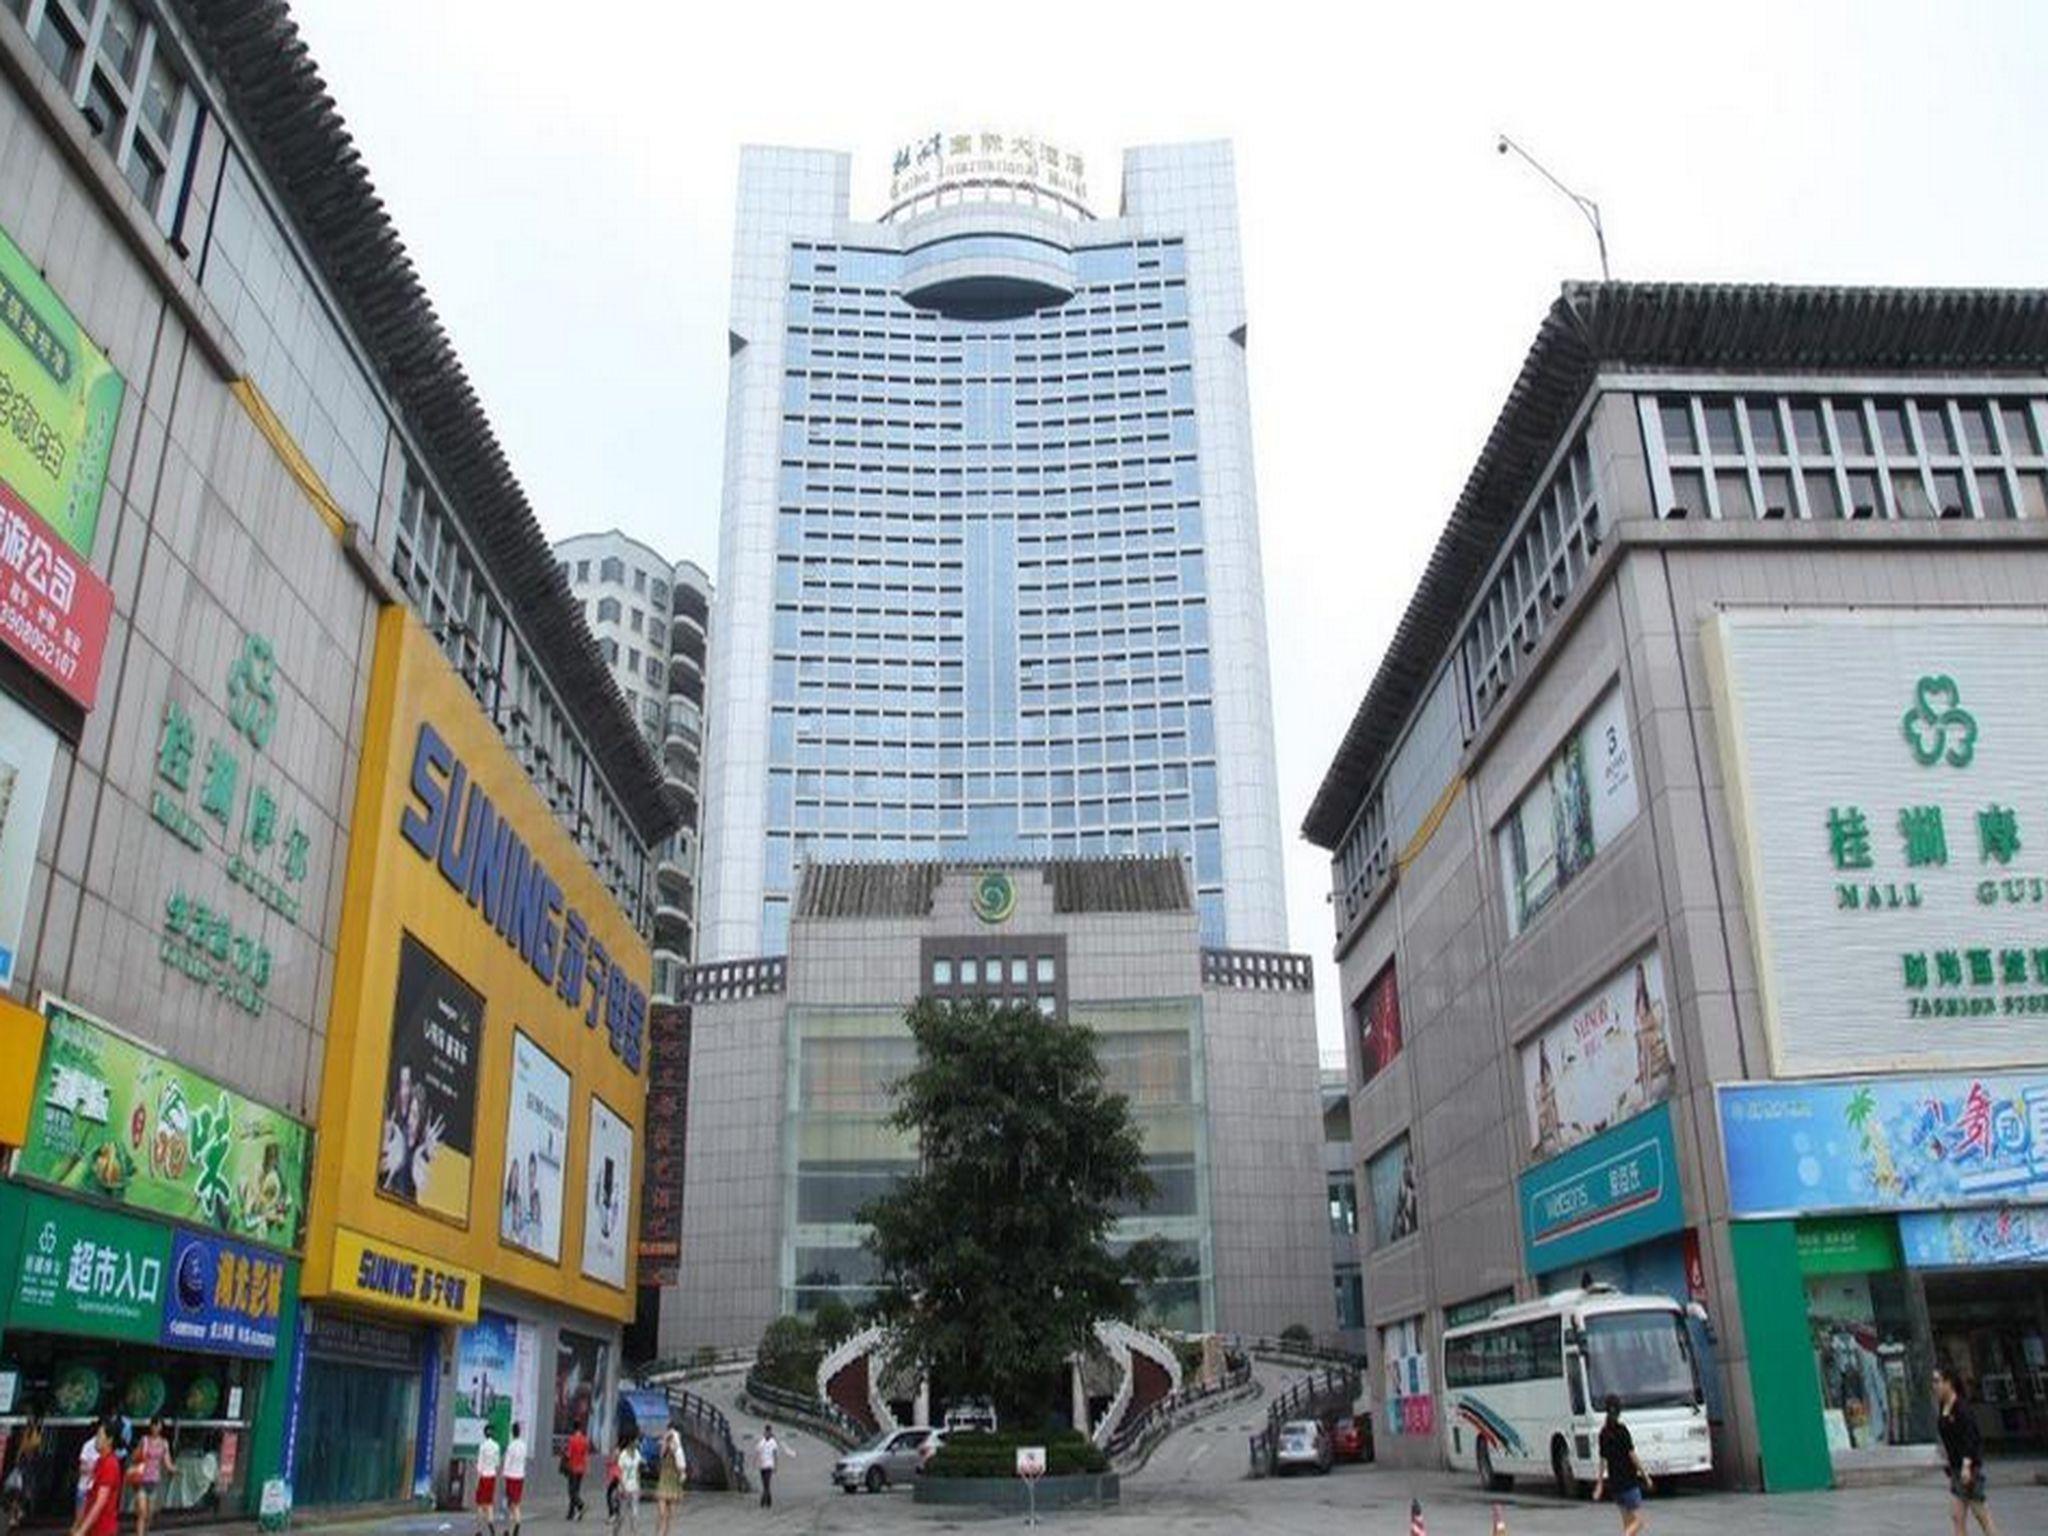 Chengdu Guihu International Hotel